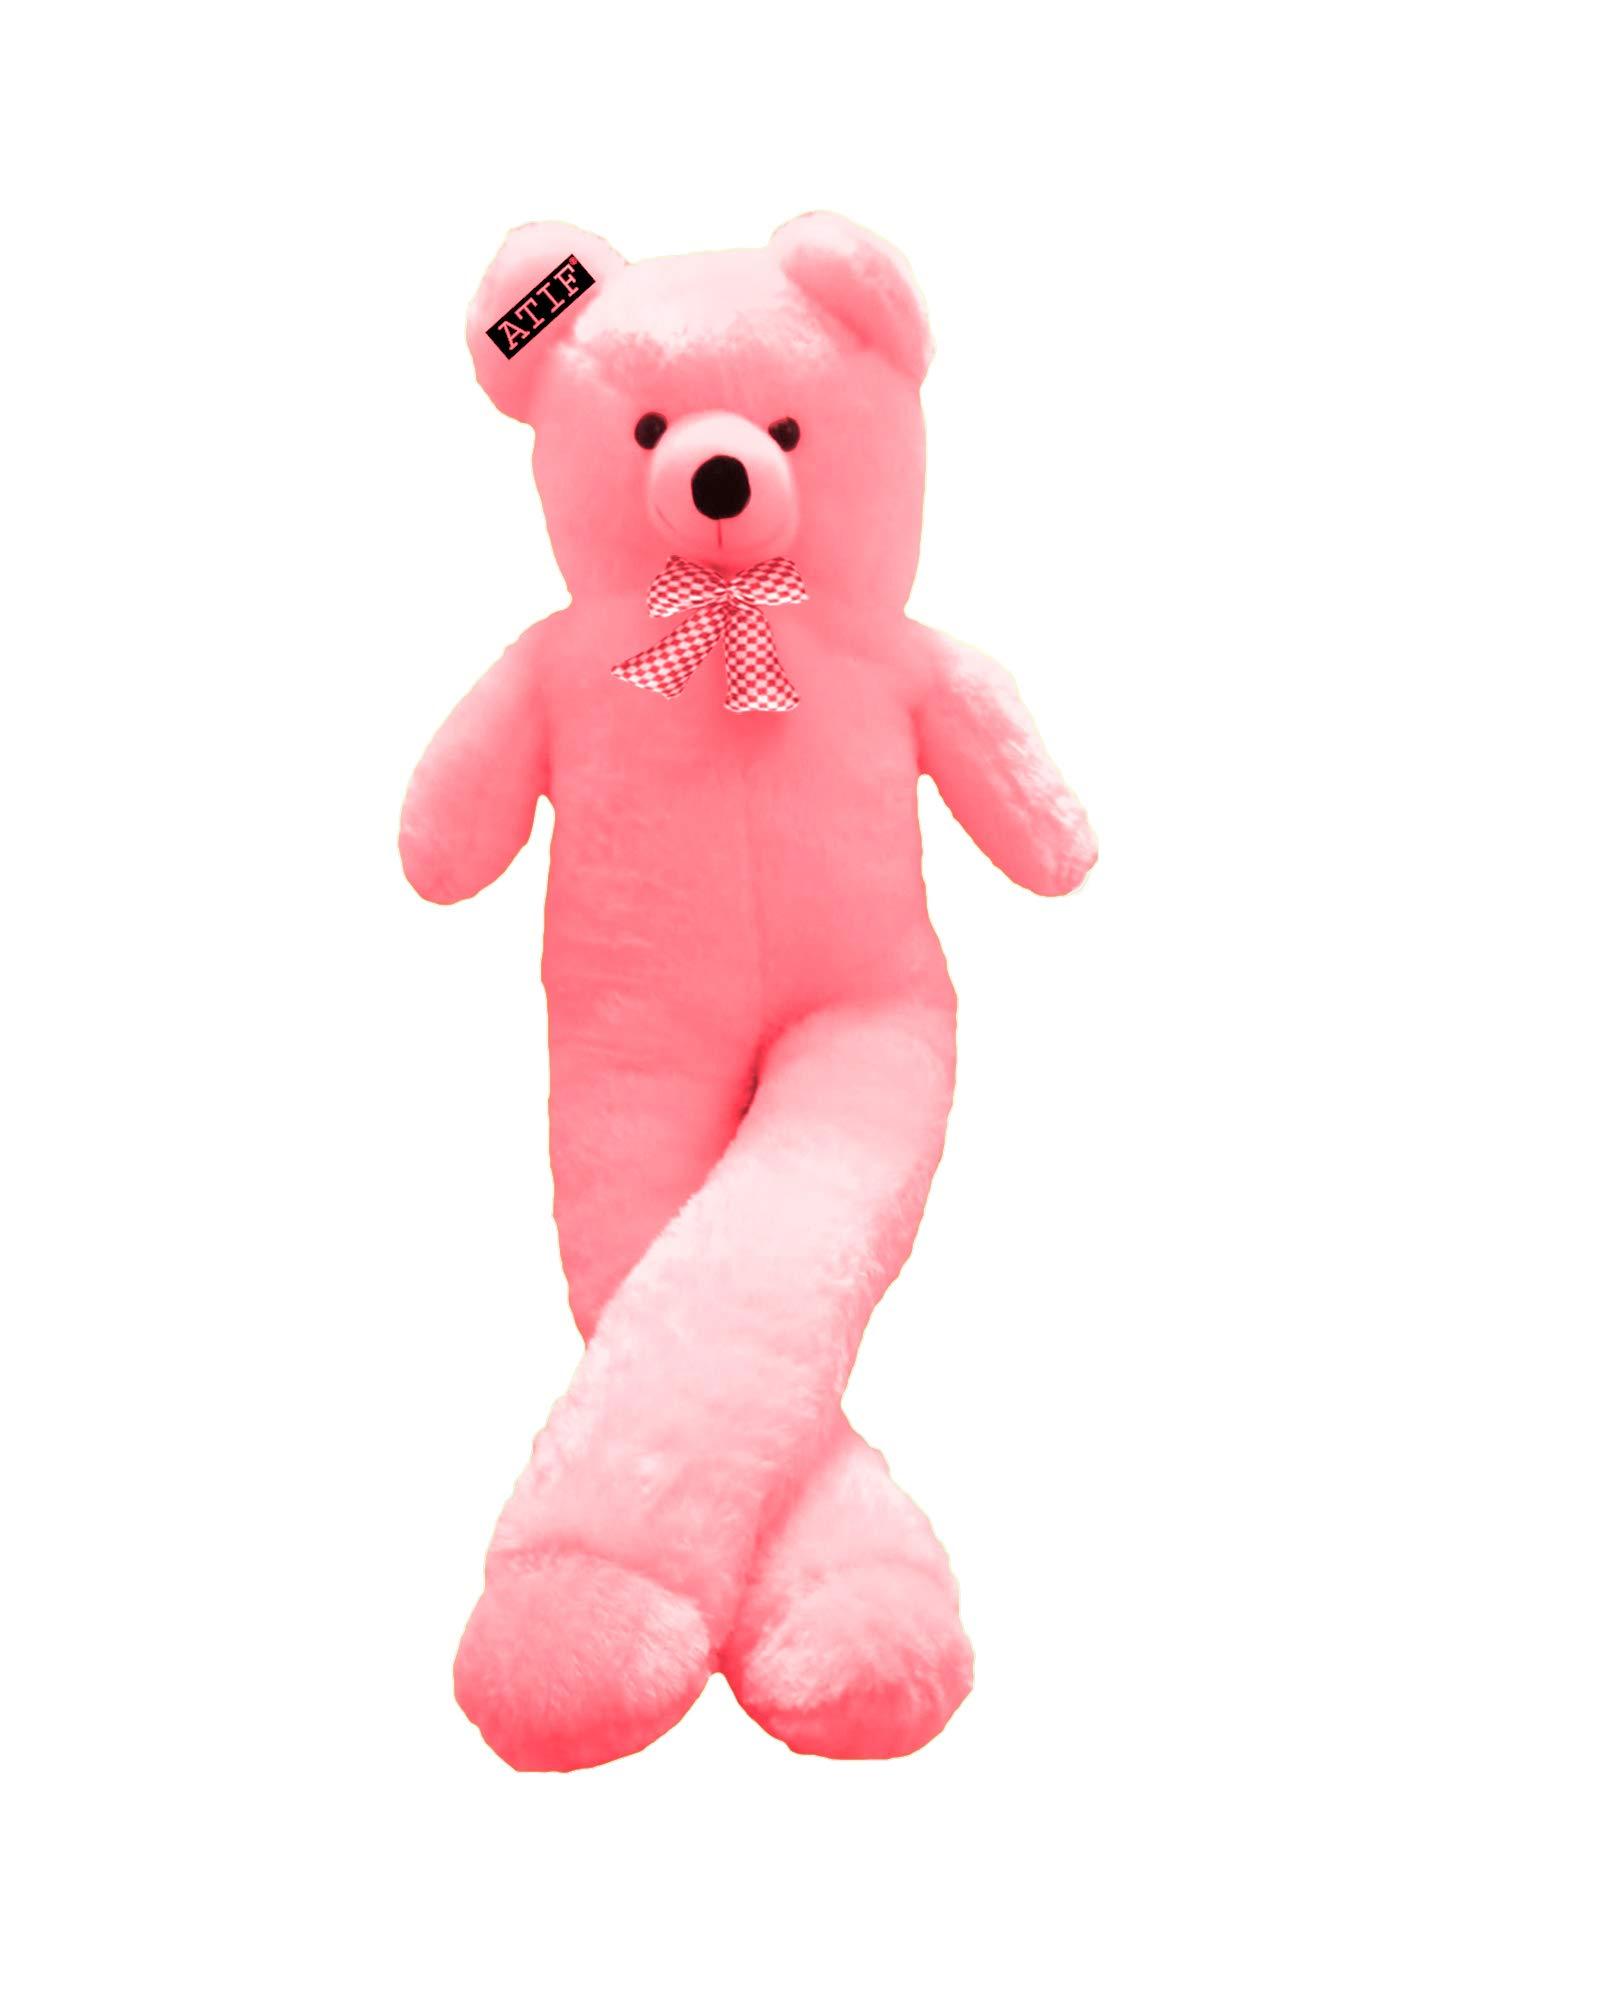 ATIF 6 Feet Big Teddy Bear sof Toys ( Pink Color )180 cm (B07Q31RF5H) Amazon Price History, Amazon Price Tracker